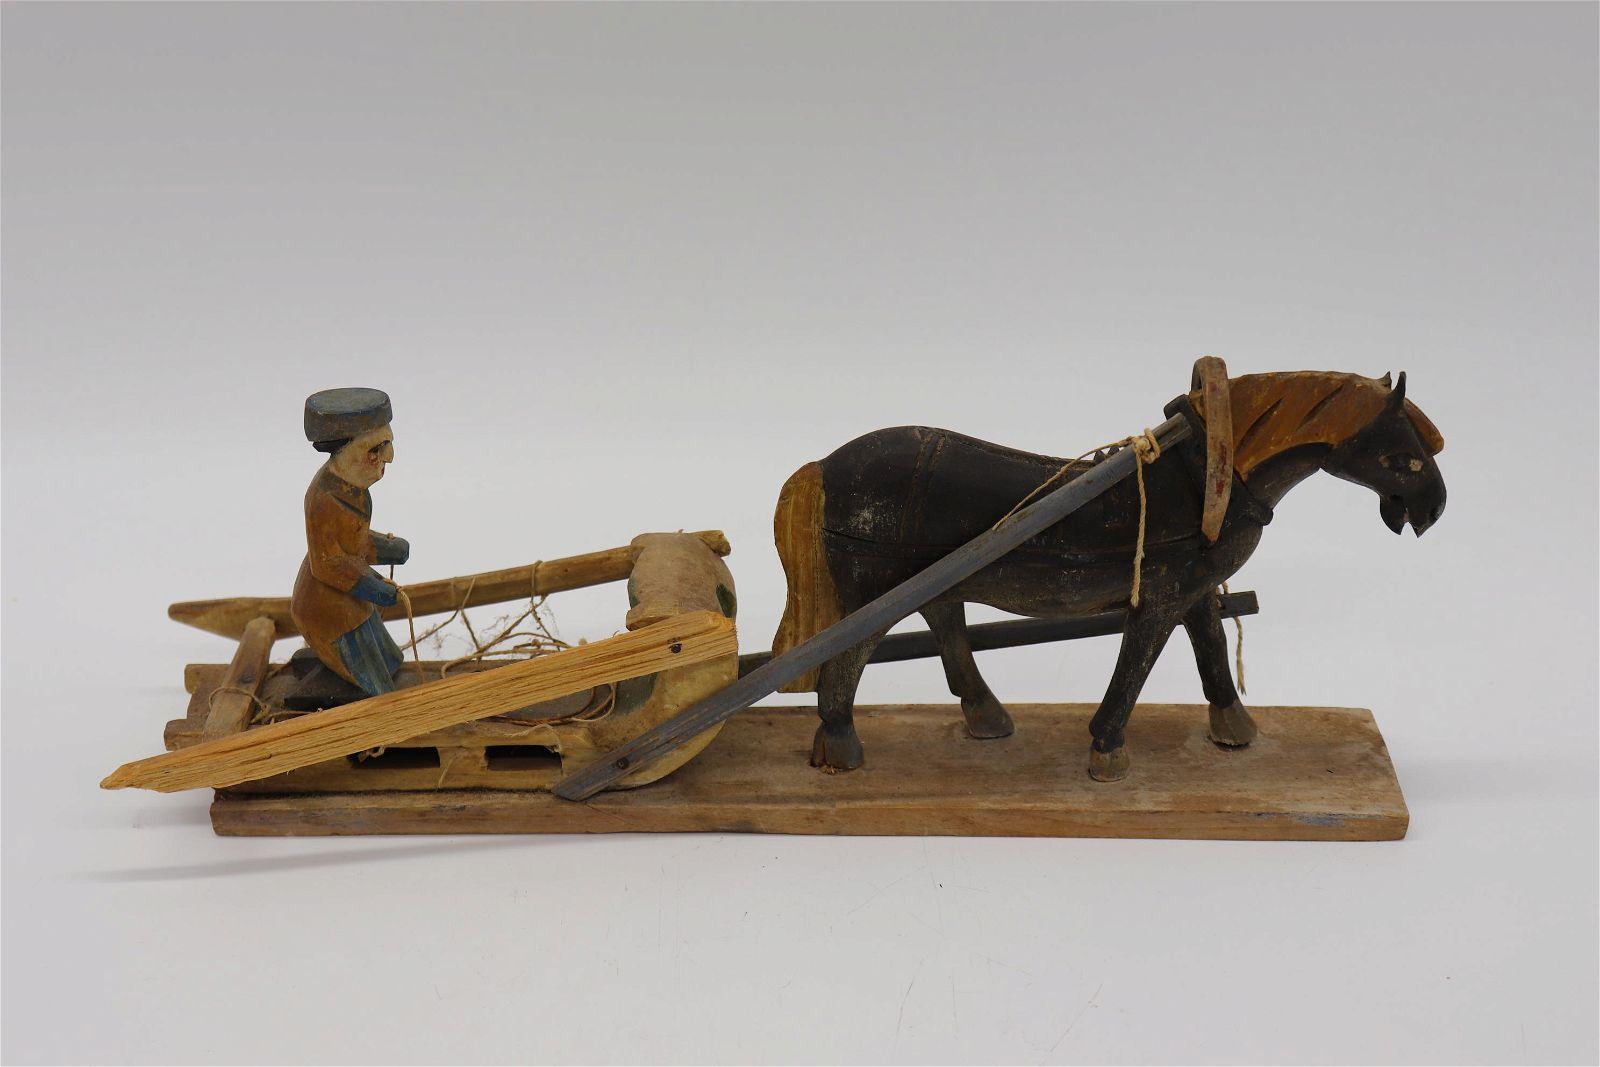 Wooden Folk Art Carving Horse & Man in Sled